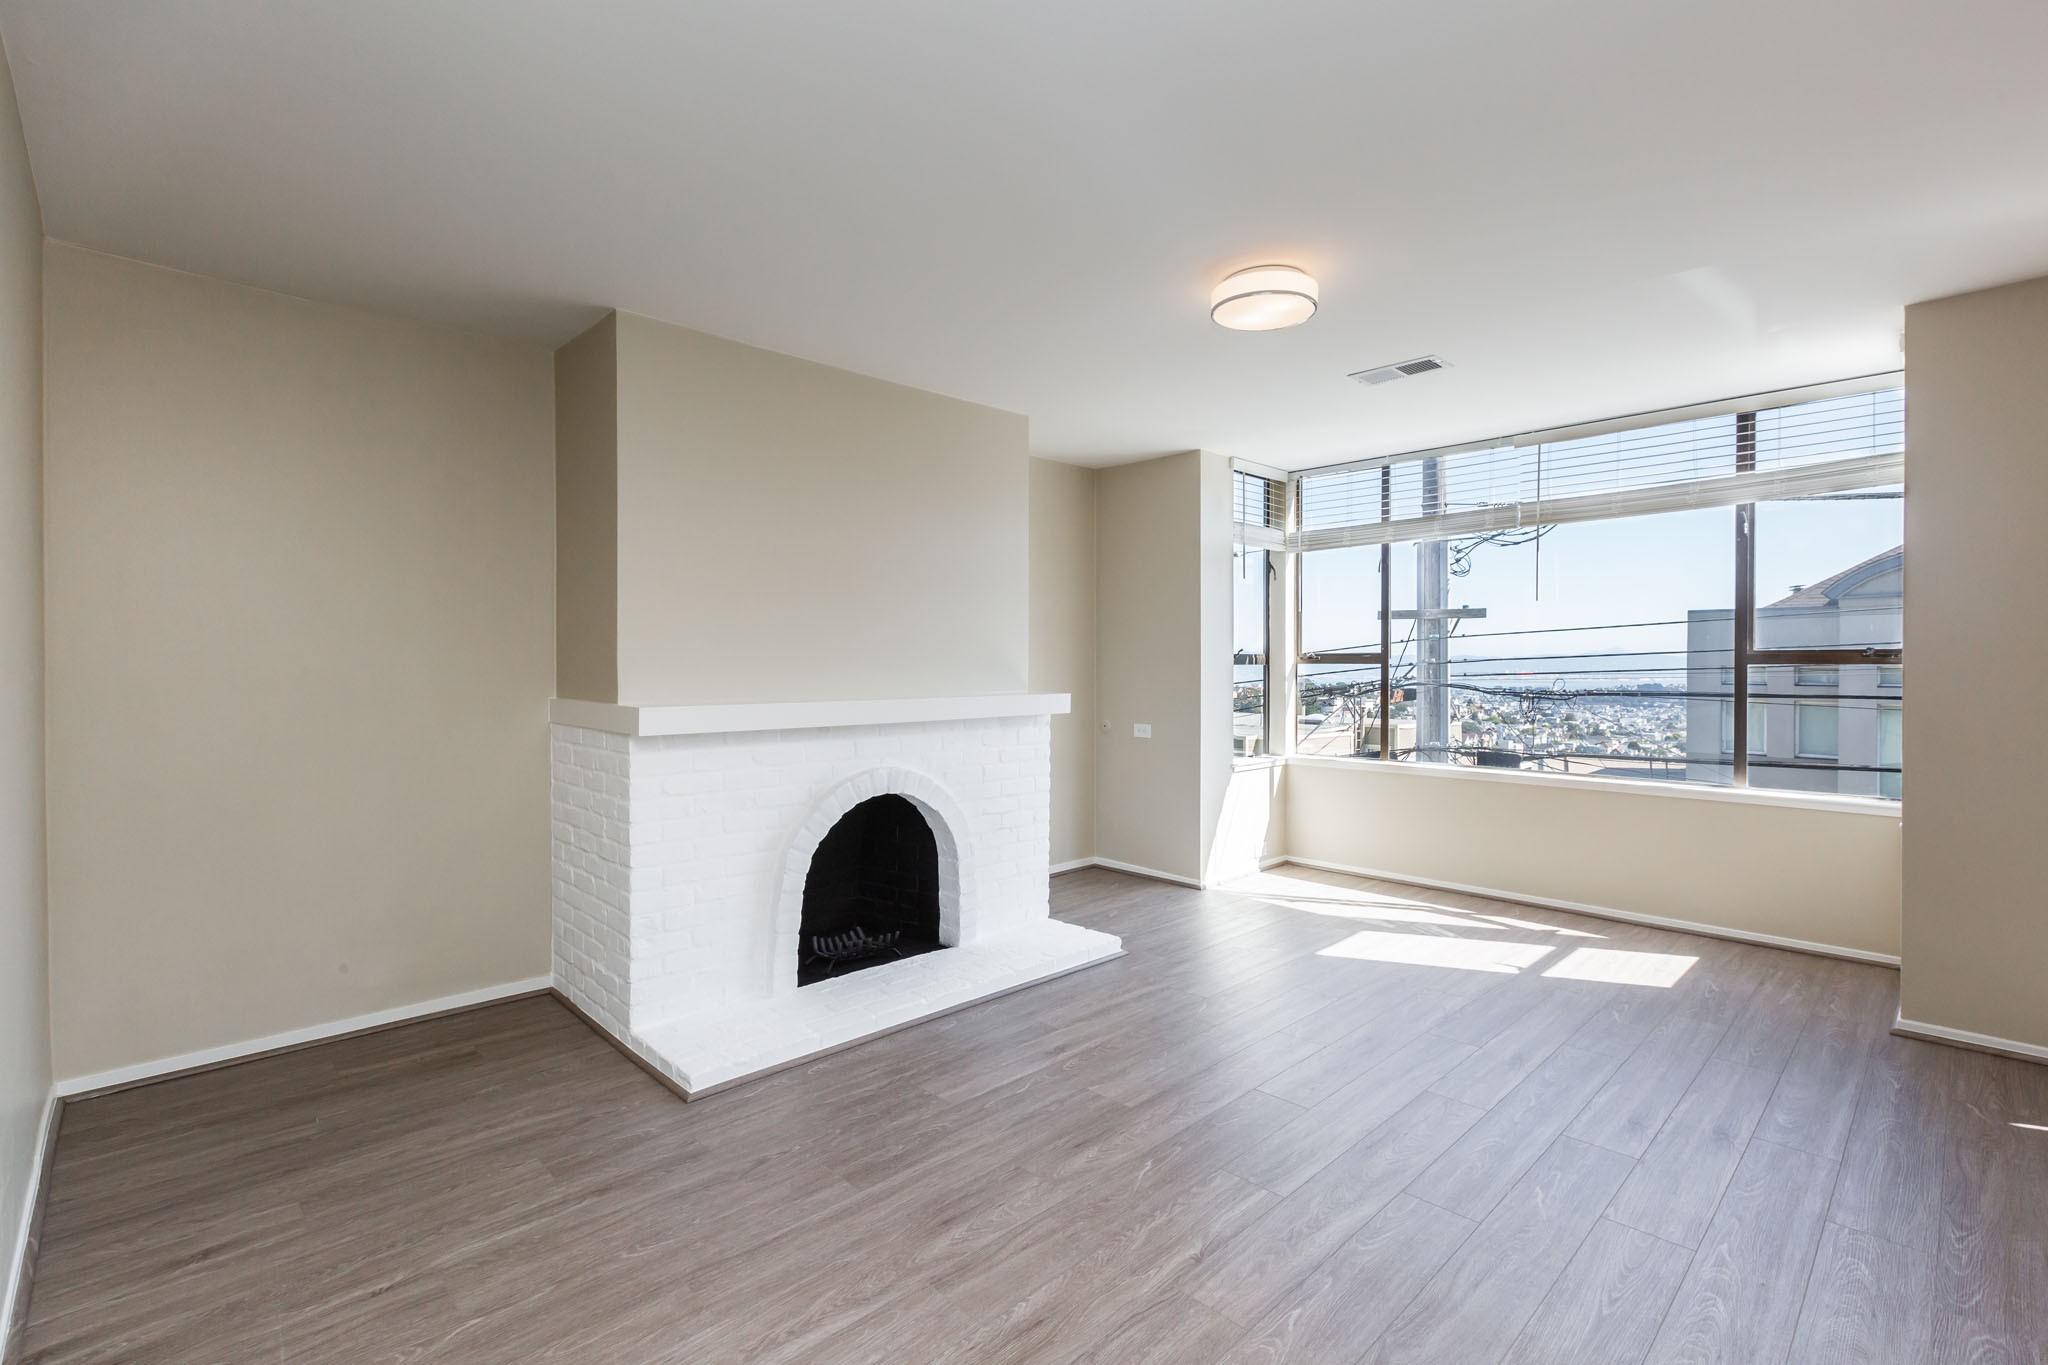 630 GRAND VIEW AVENUE Apartments